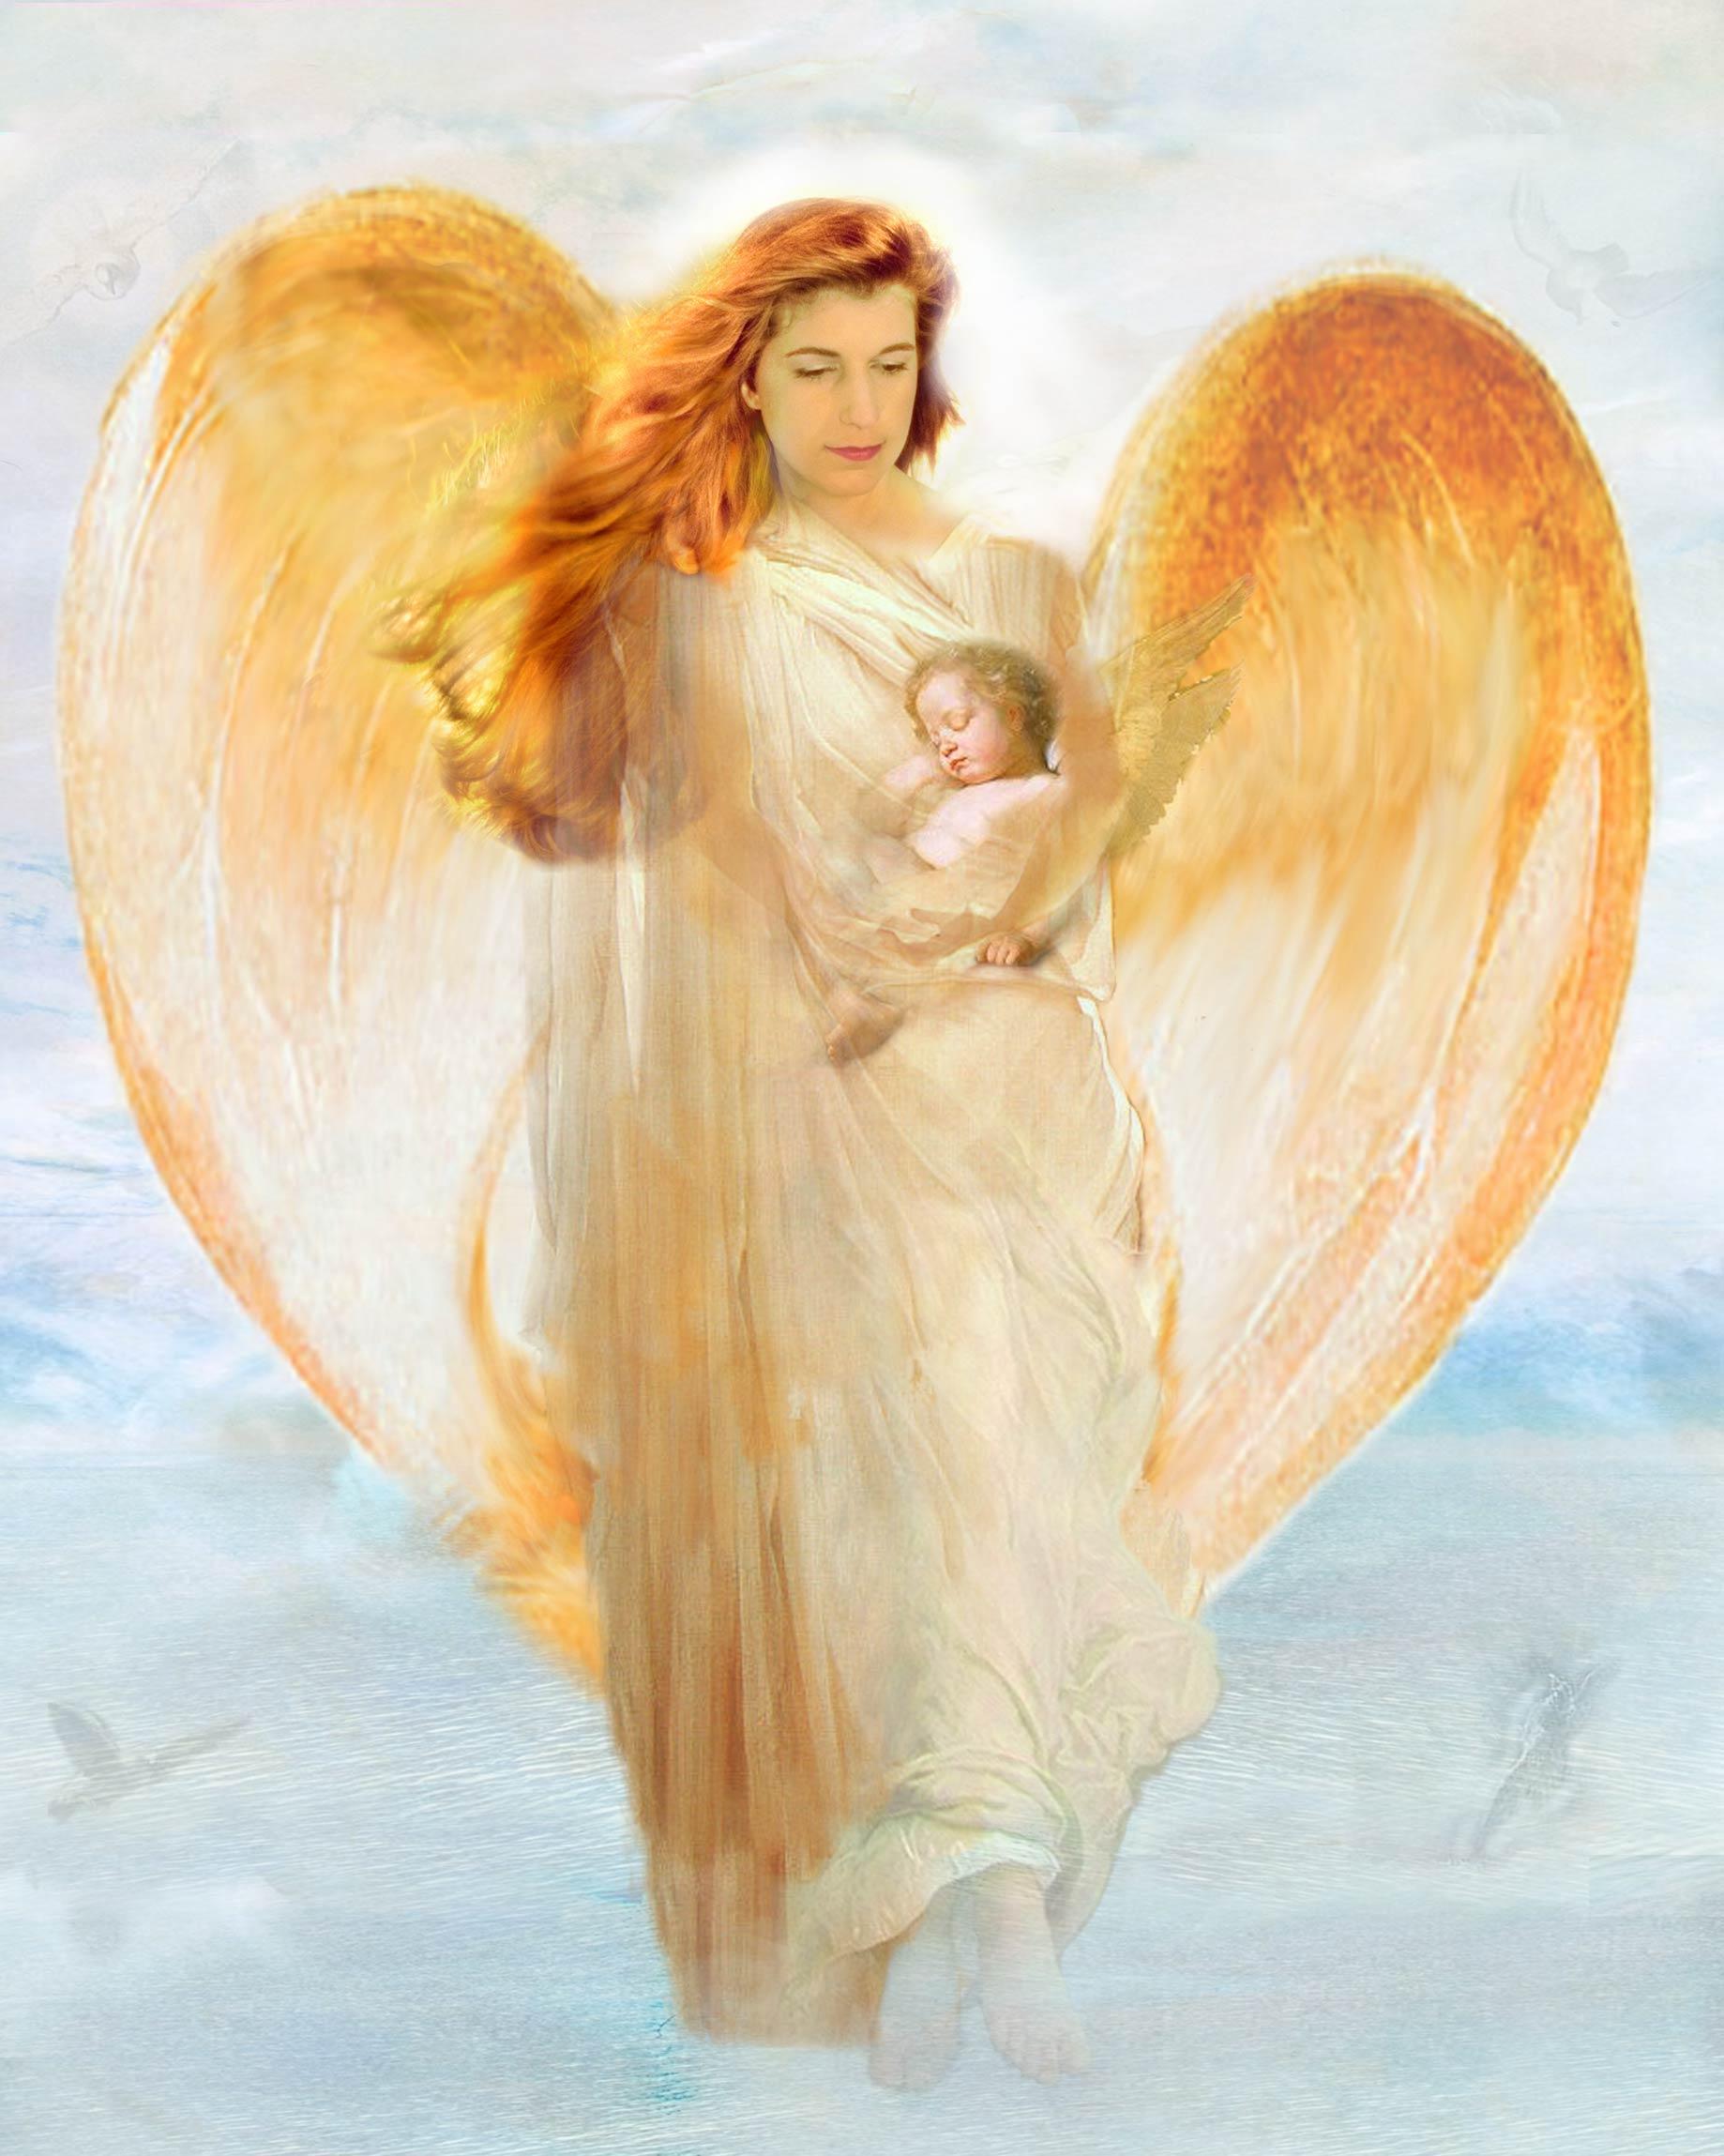 guardian angel - photo #32